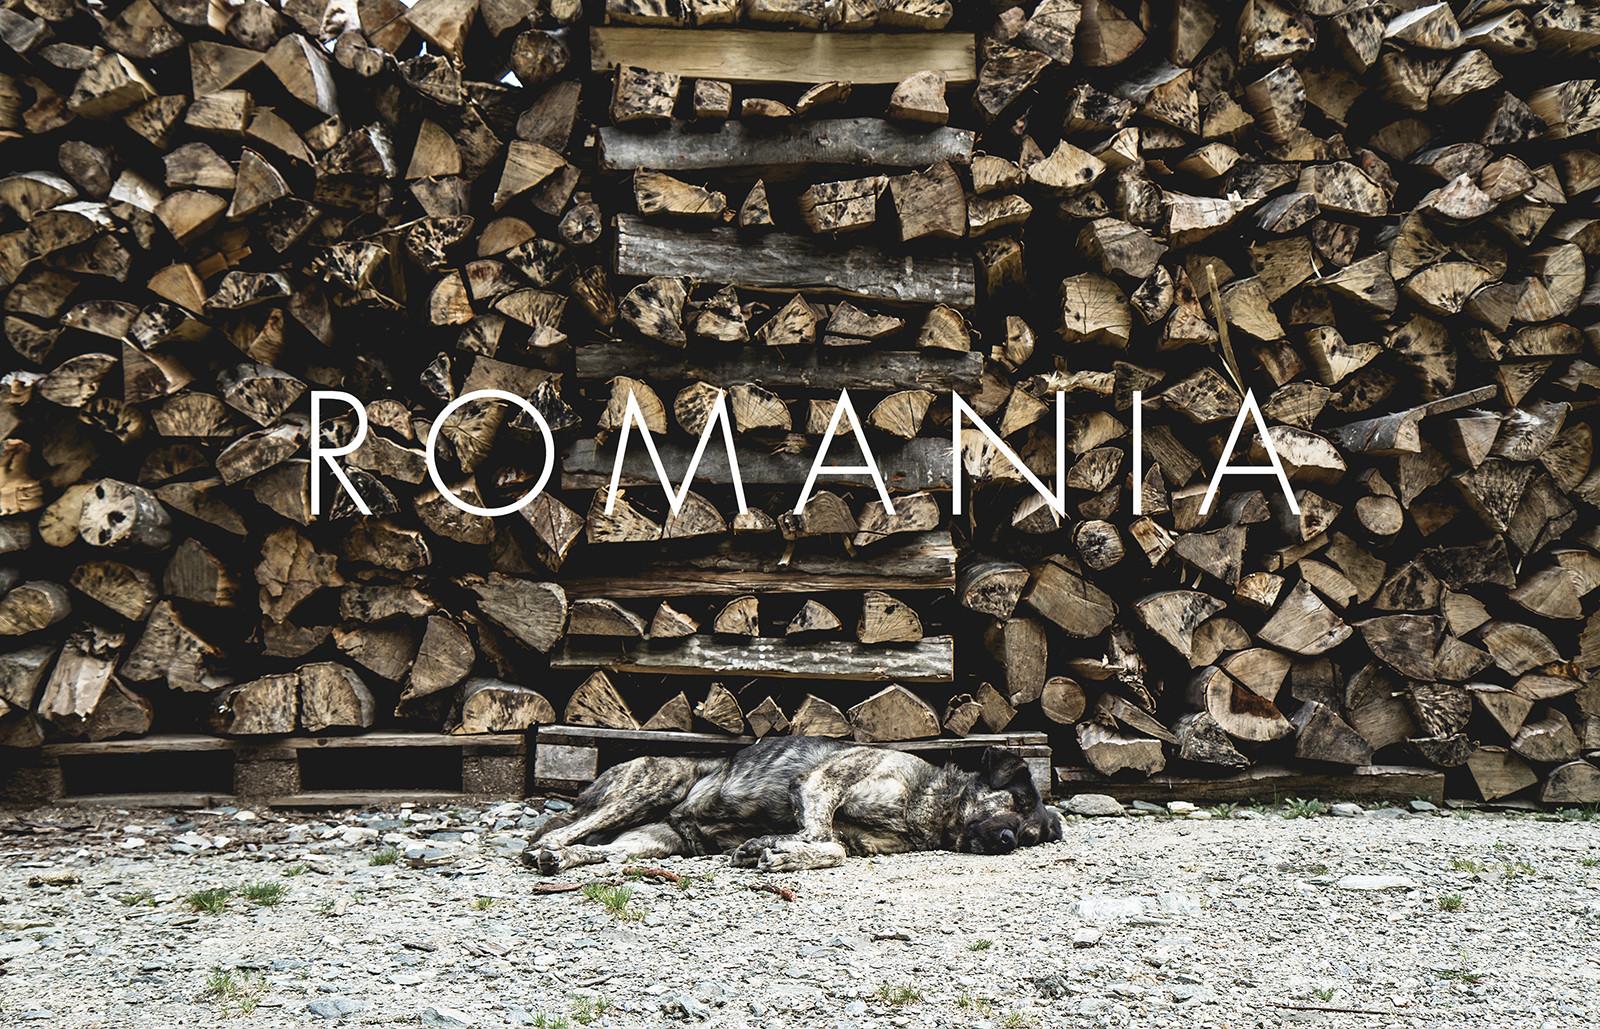 Romania_TITLE.jpg